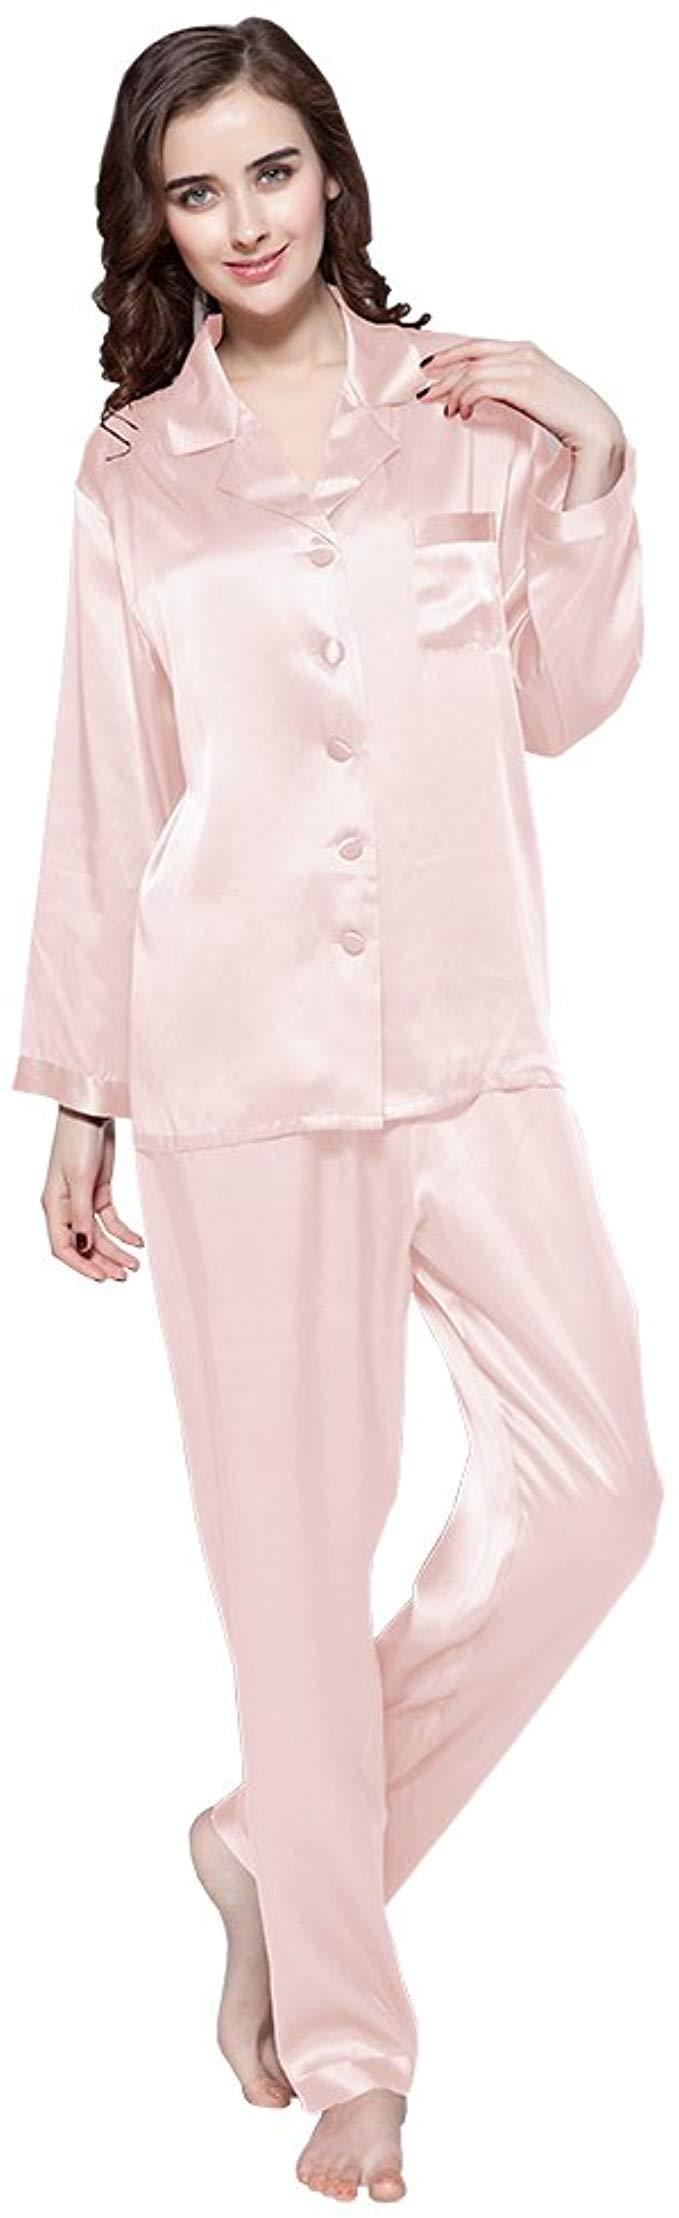 Seidenschlafanzug Damen hellrose